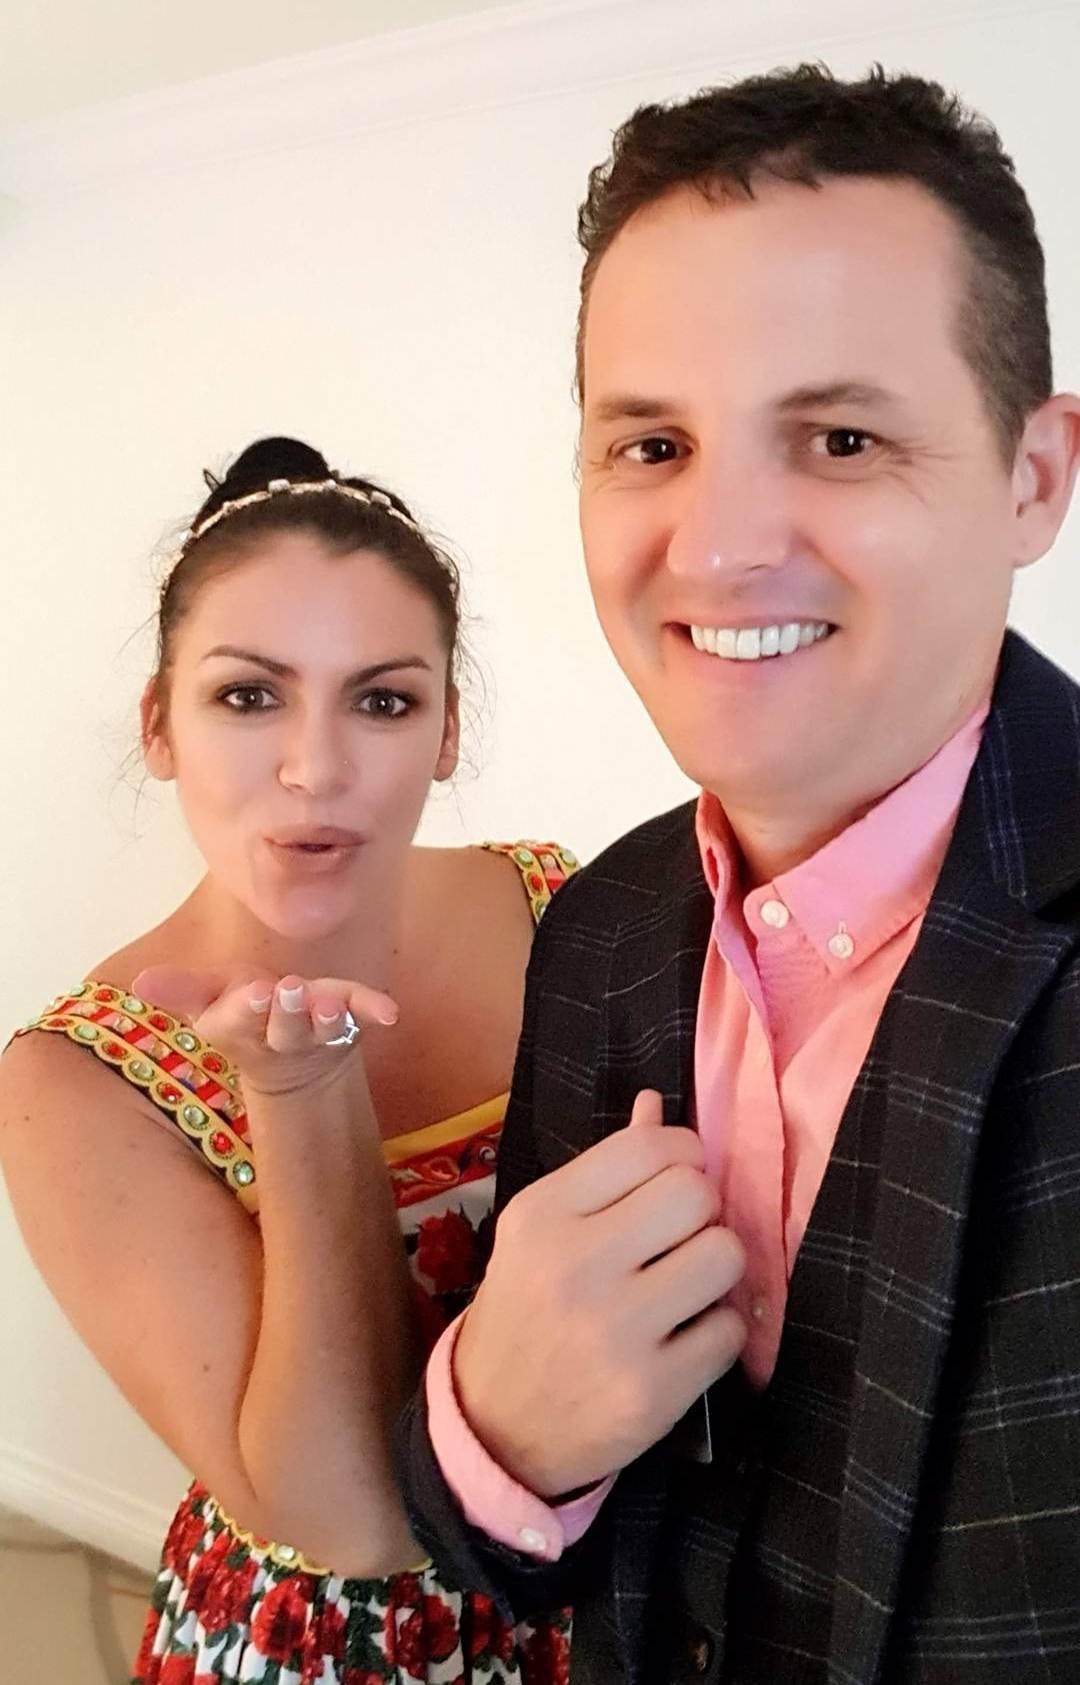 samantha clark waters wedding husband amalfi dress disrupt unconventional blog 5